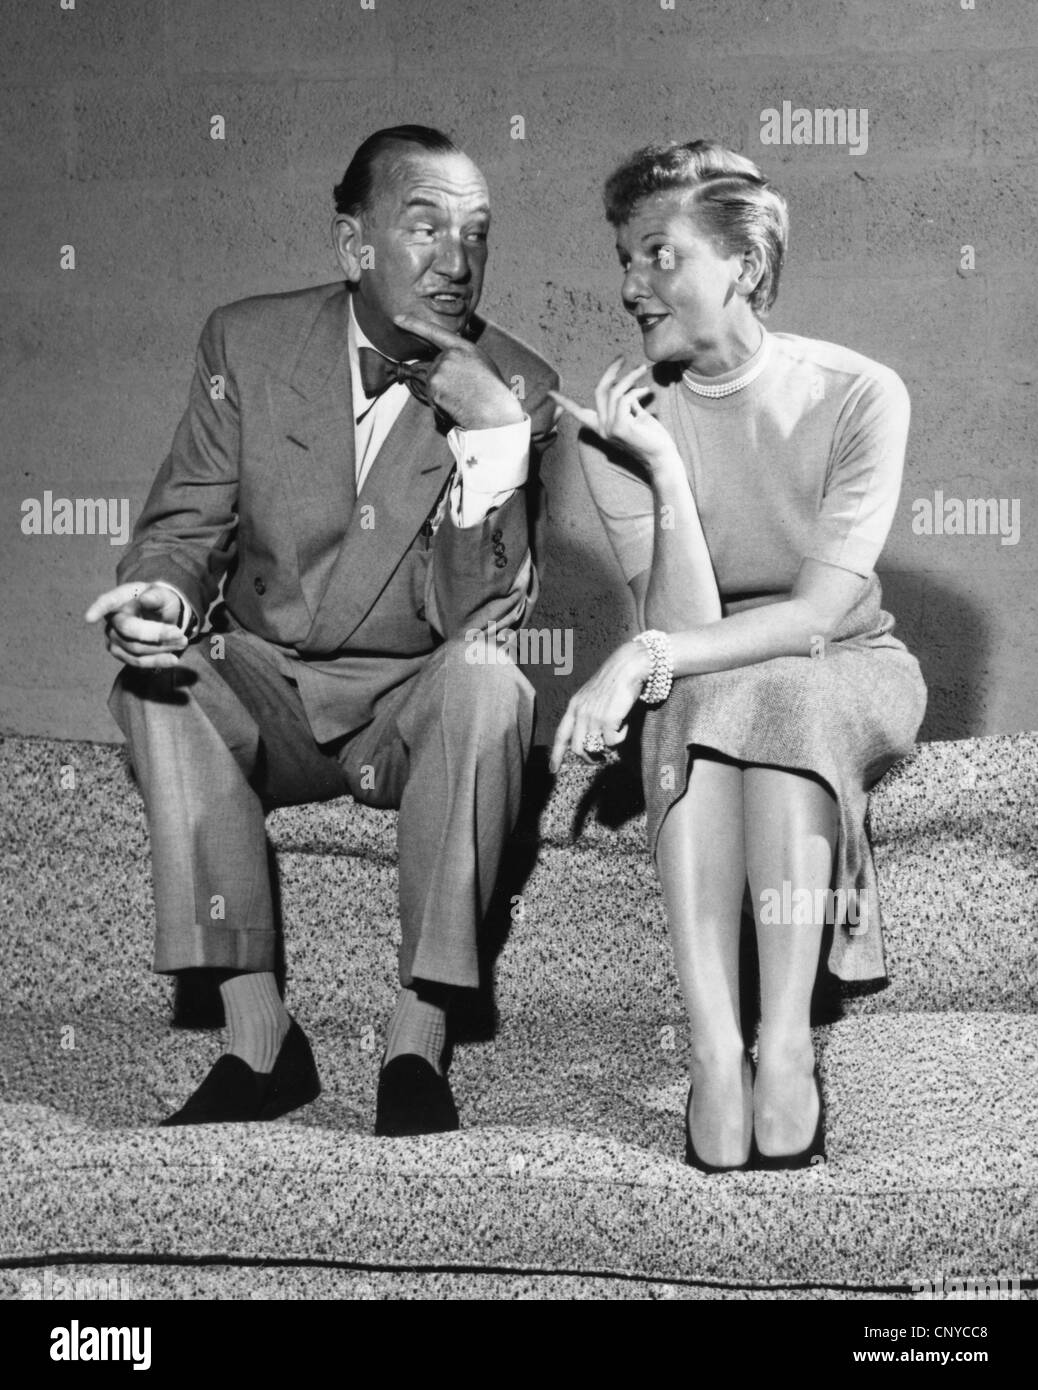 JoBeth Williams,Jeanne Cagney Sex fotos Pat Evison,Daniela Rocca (1937?995)